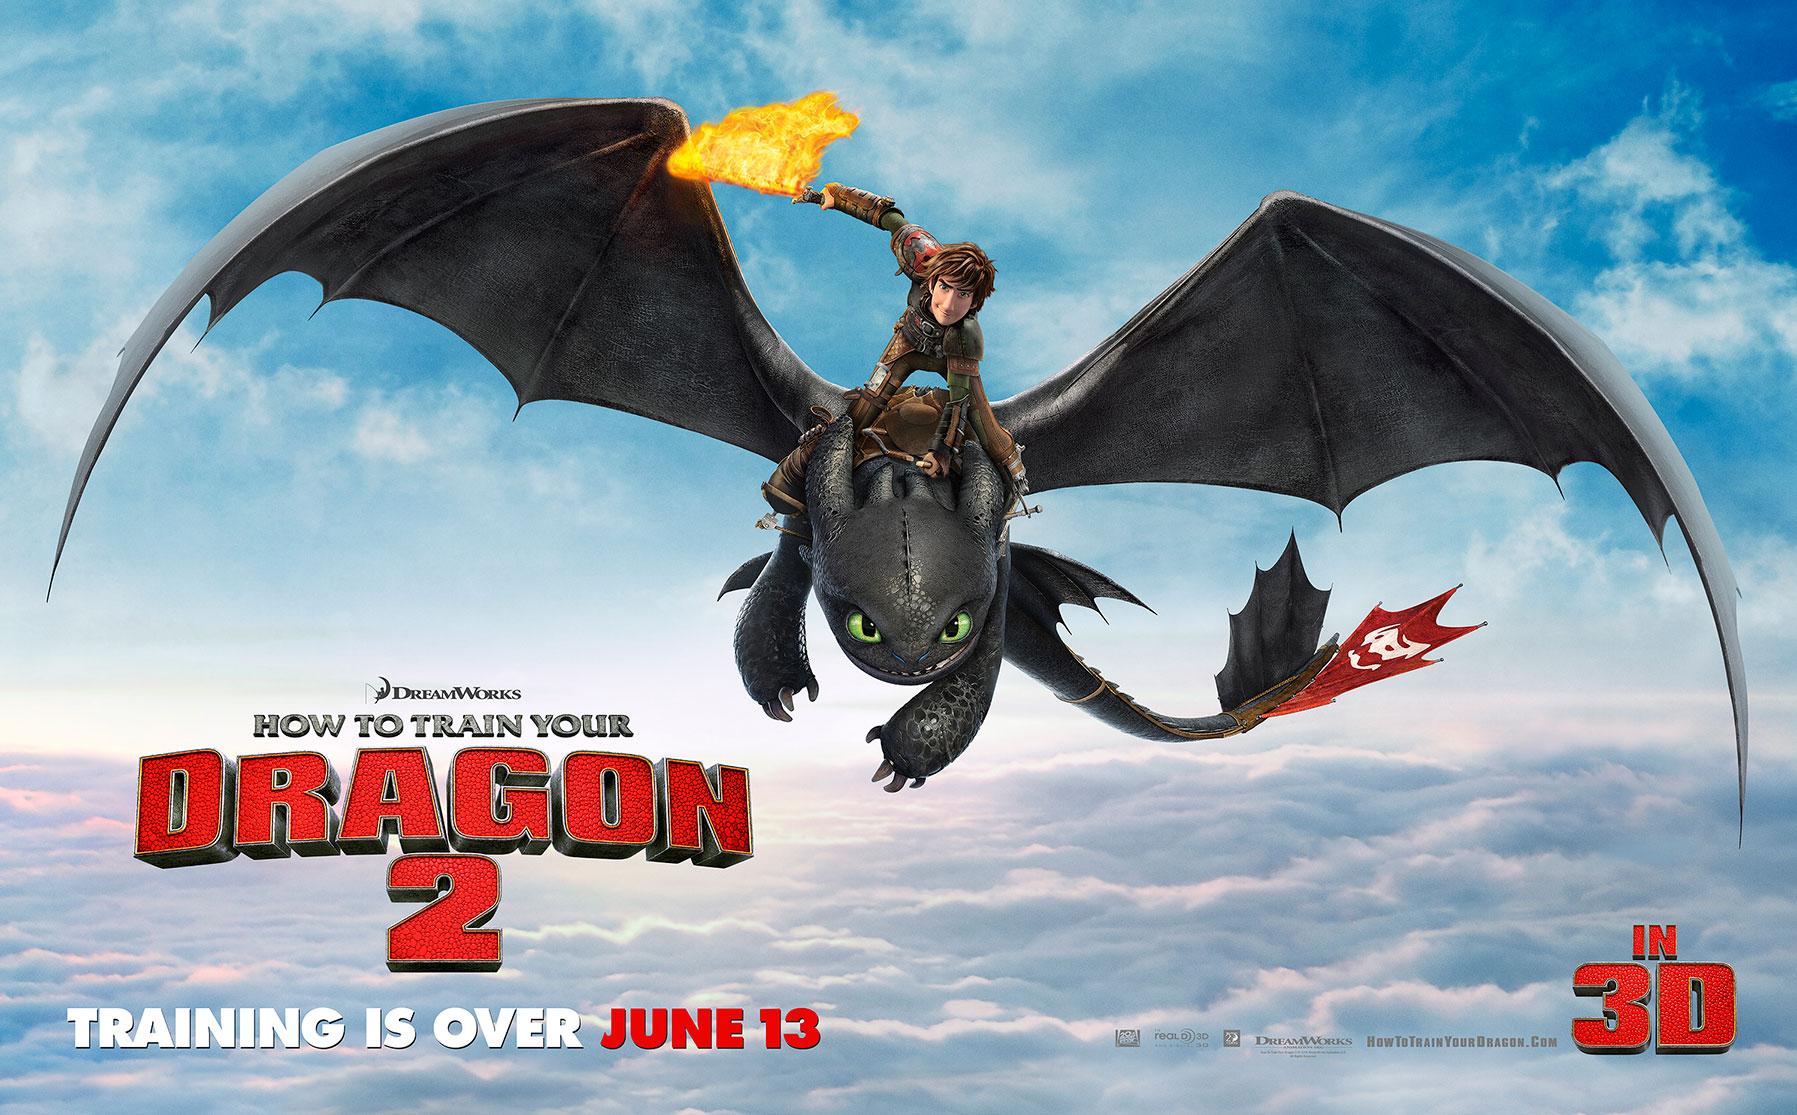 How To Train Your Dragon 2 Ten30 Studios